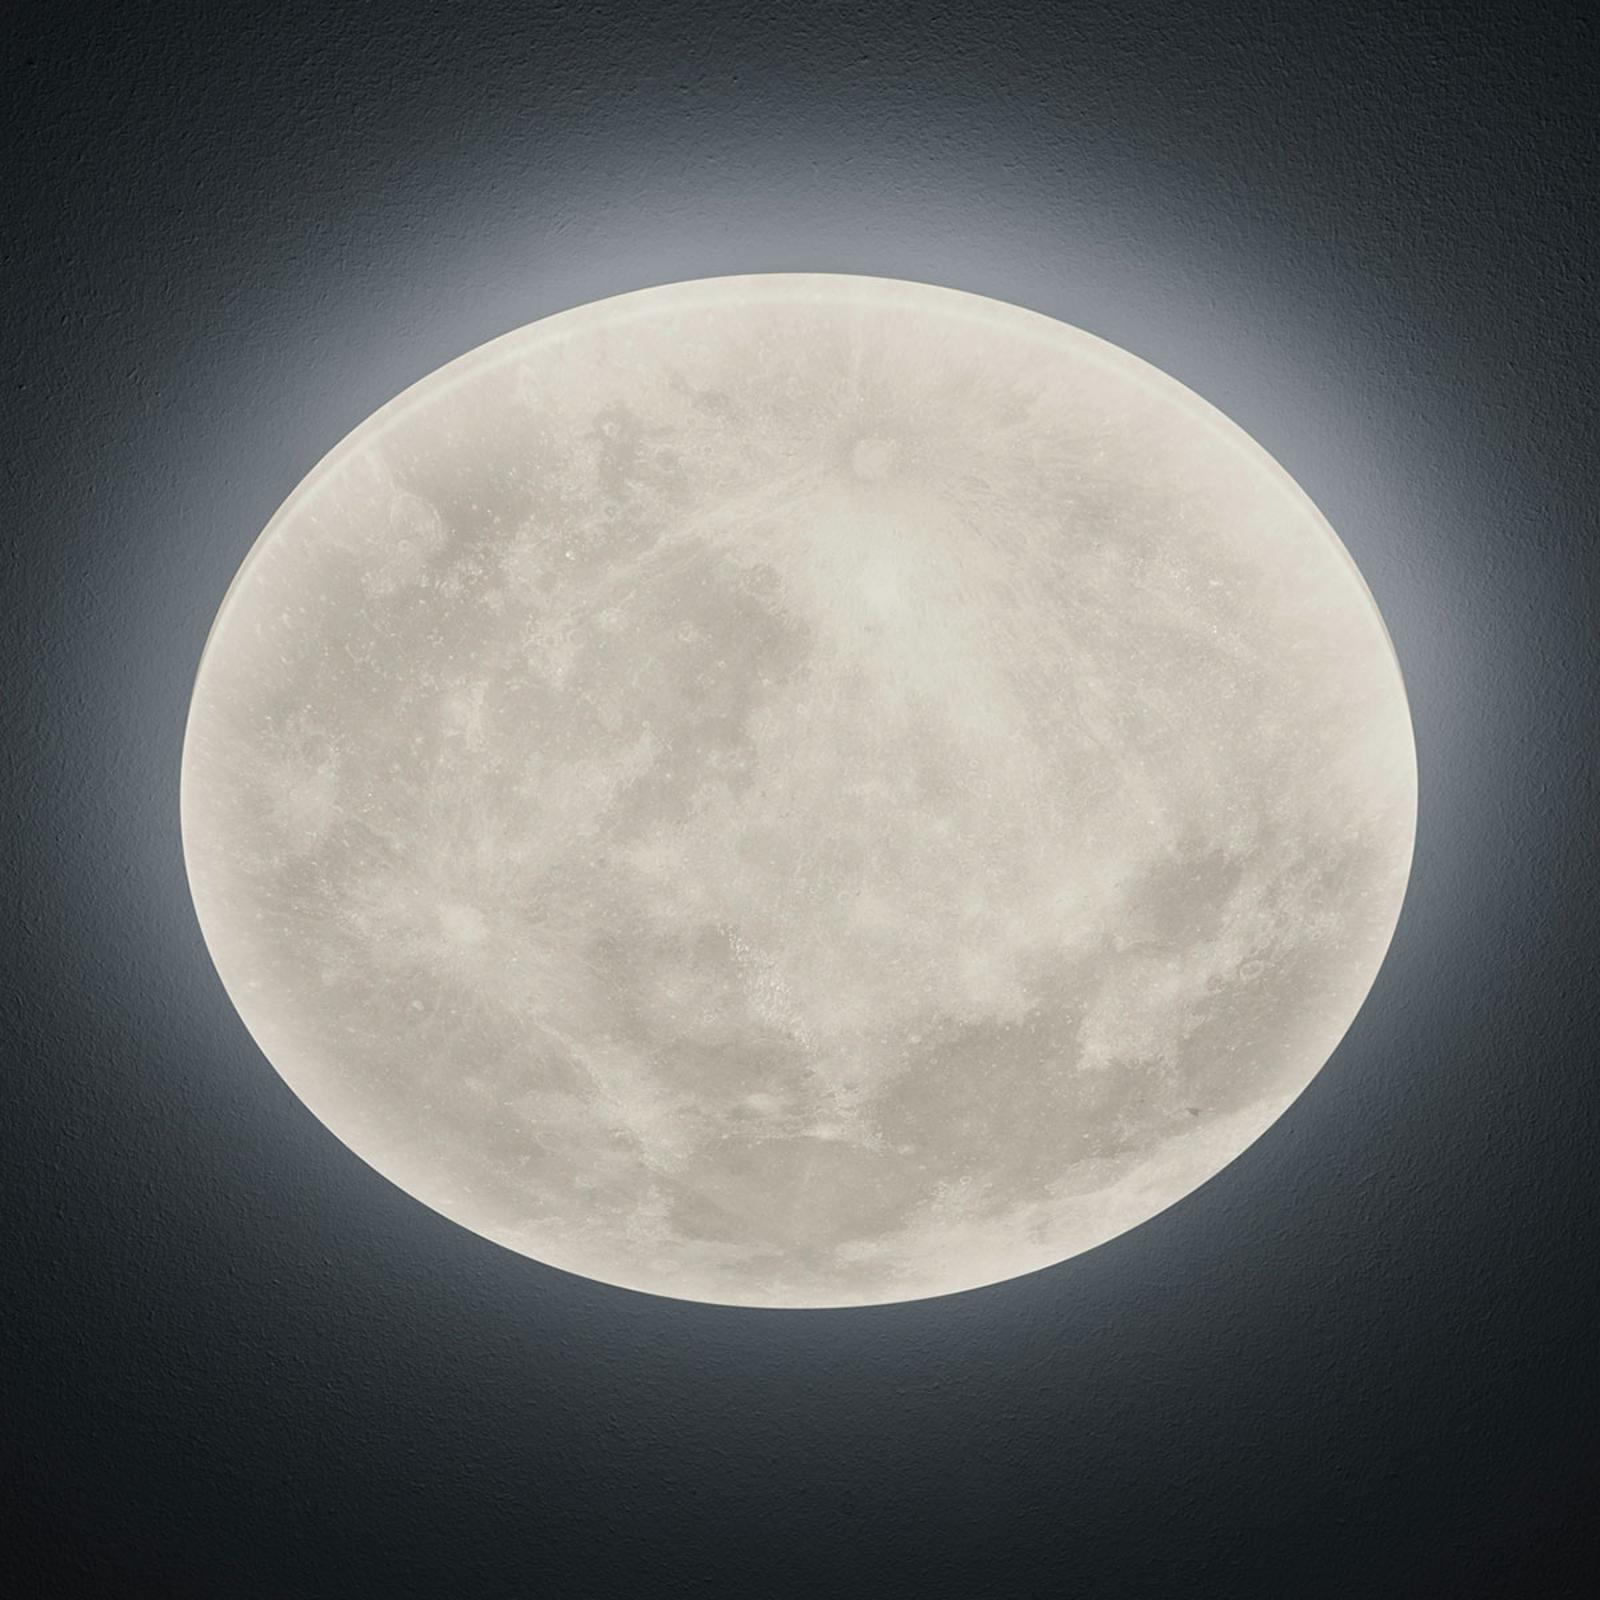 LED-loftlampe Lunar med fjernbetjening 40cm